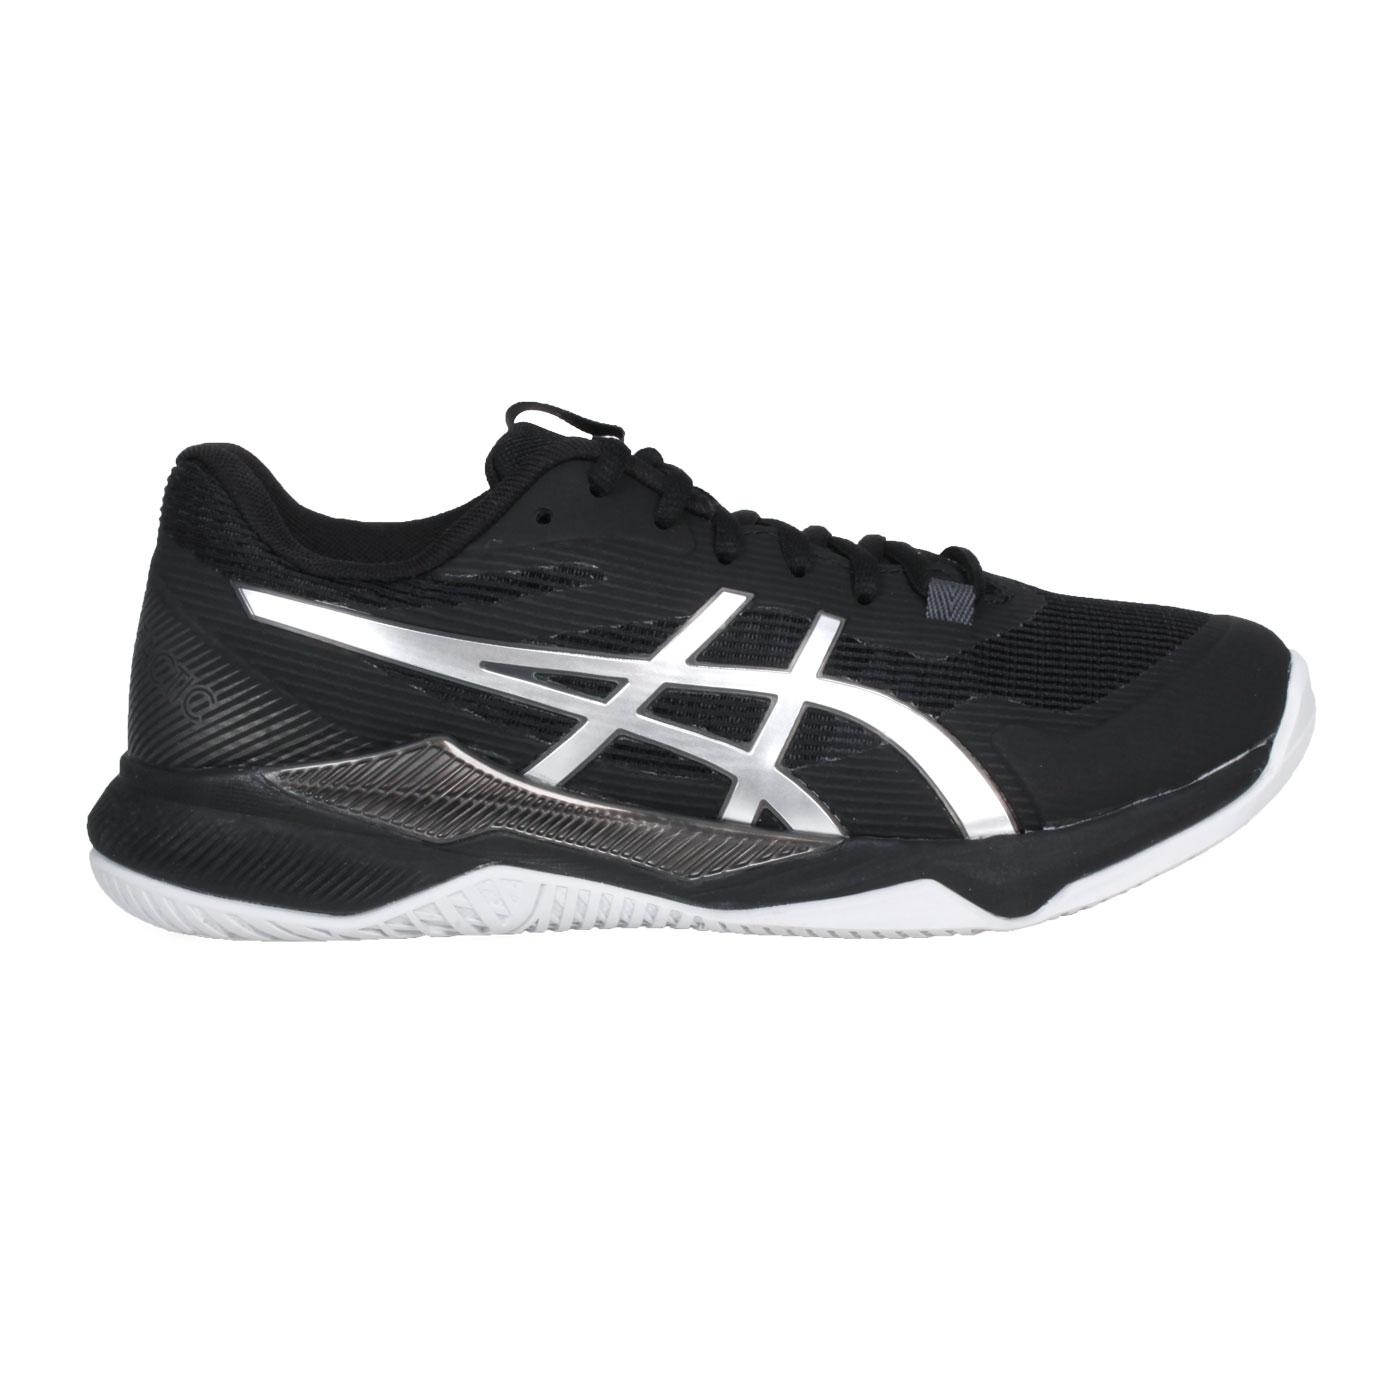 ASICS 排羽球鞋  @GEL-TACTIC@1073A051-003 - 黑銀